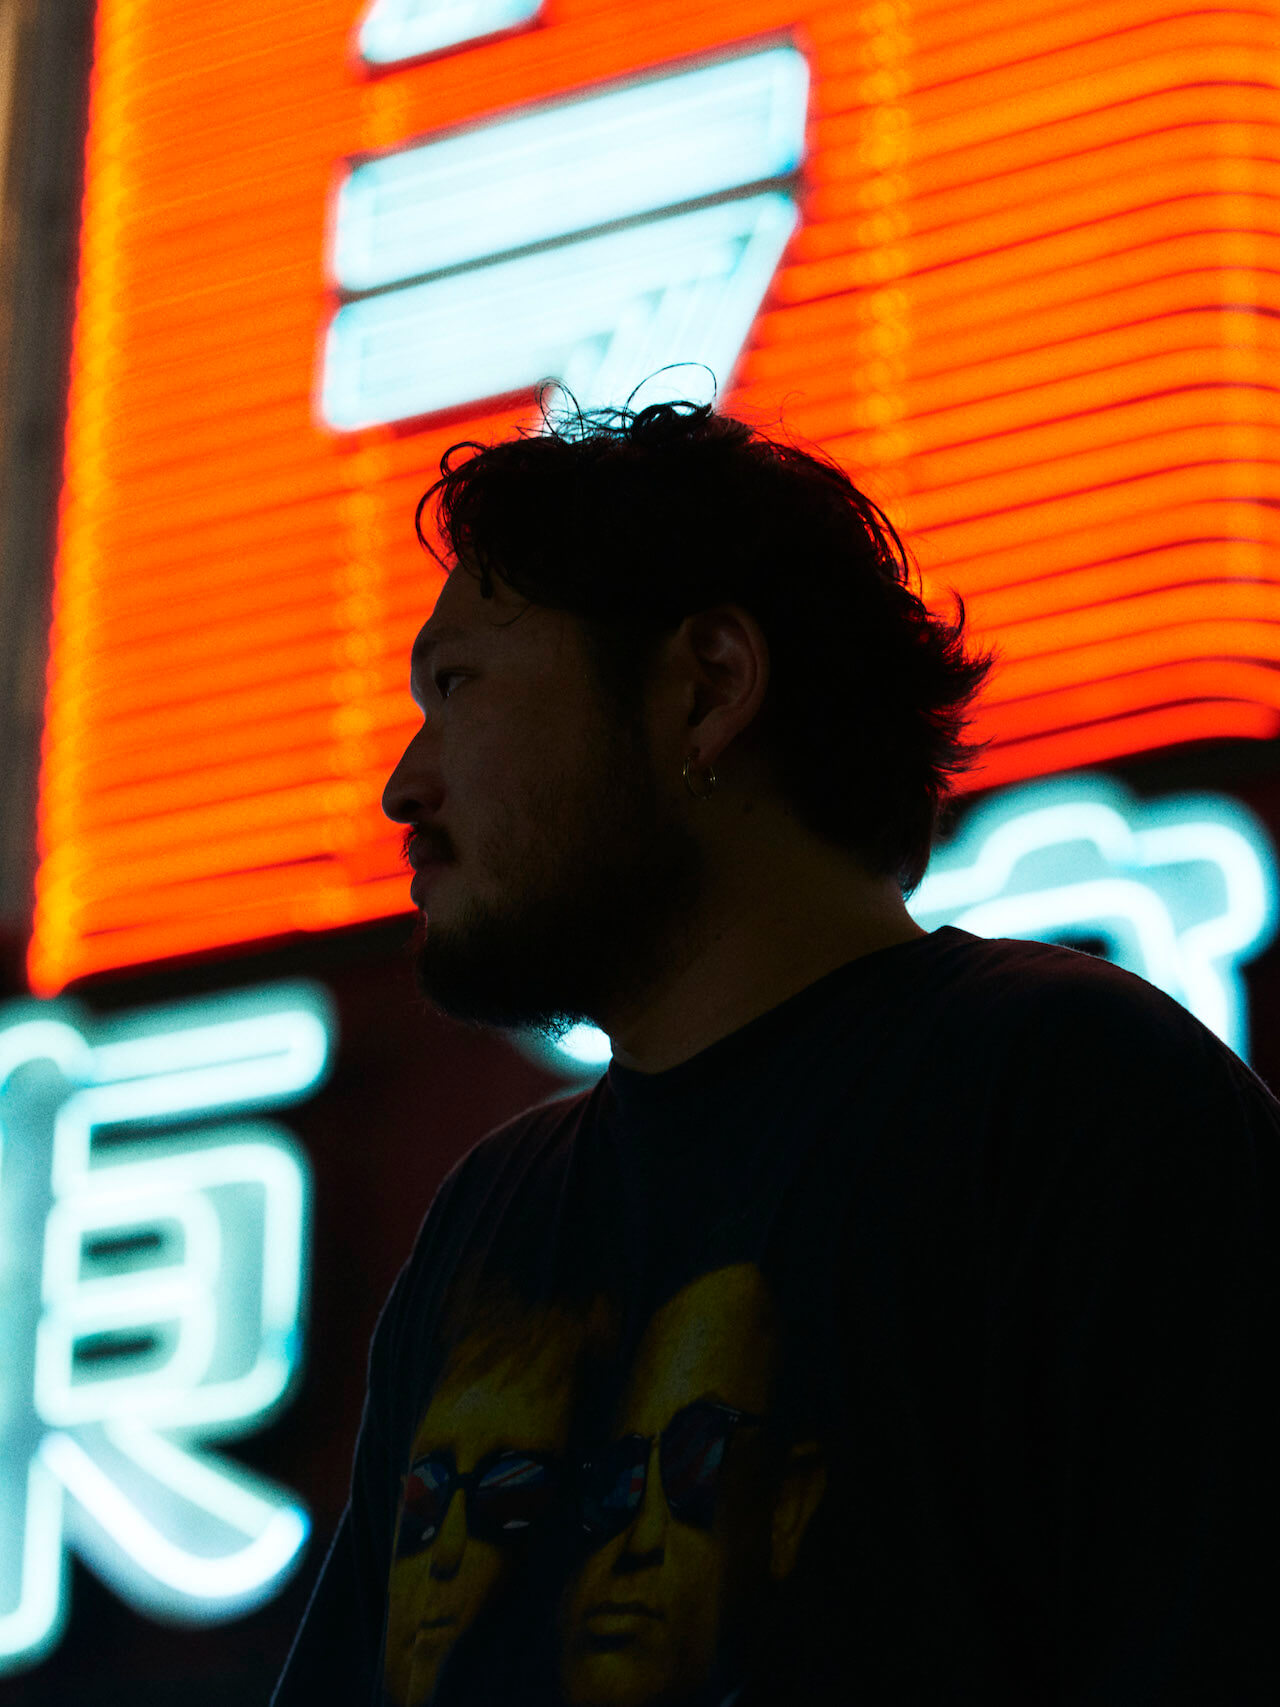 TENDOUJI×フジロック|東京オルタナシーン屈指の愛されバンドに訊く、フジロック初出演の意気込み interview190722-tendouji-2